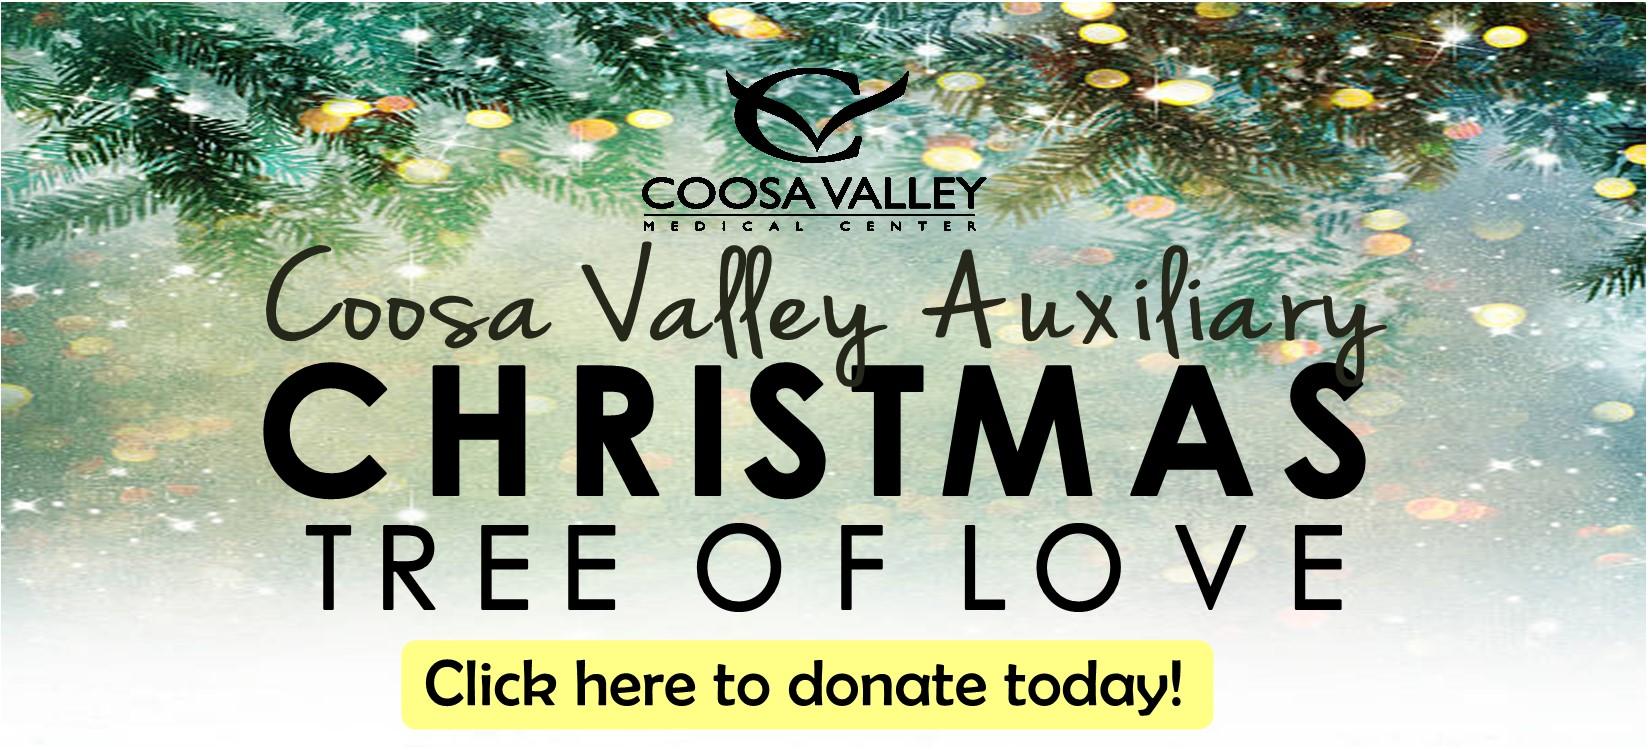 Coosa Valley Health